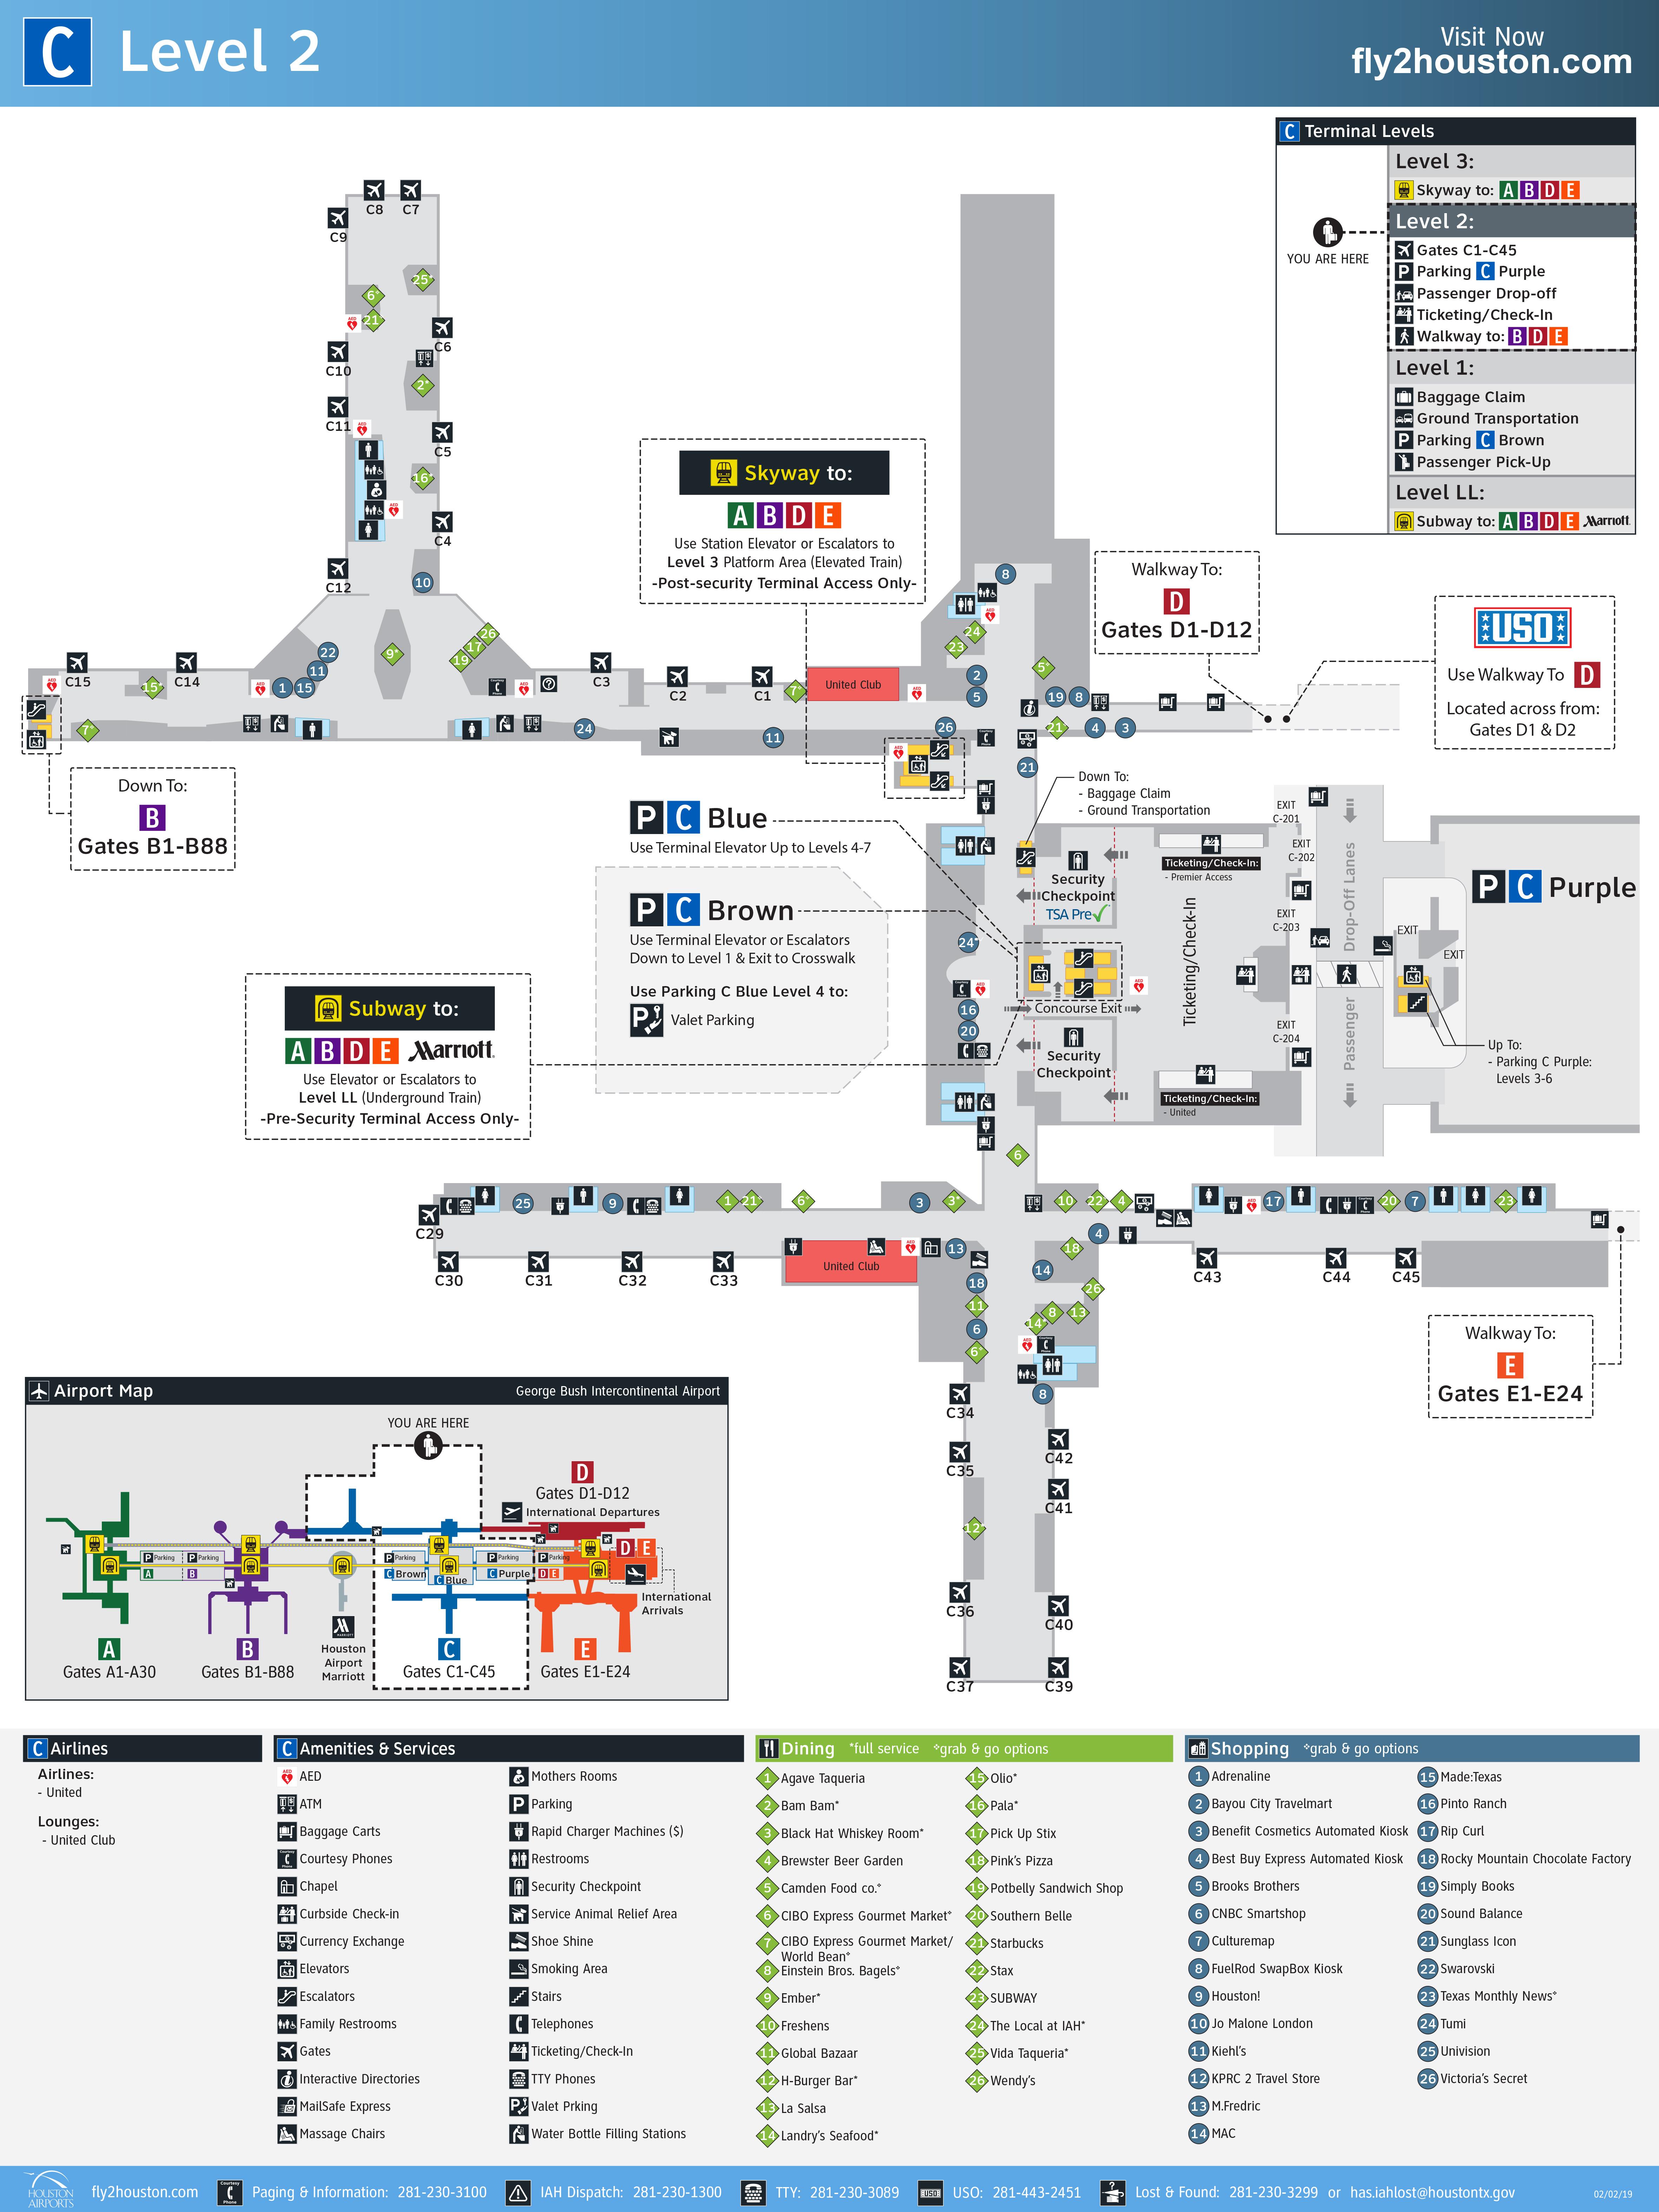 George Bush Intercontinental Airport Map (IAH) - Printable Terminal ...